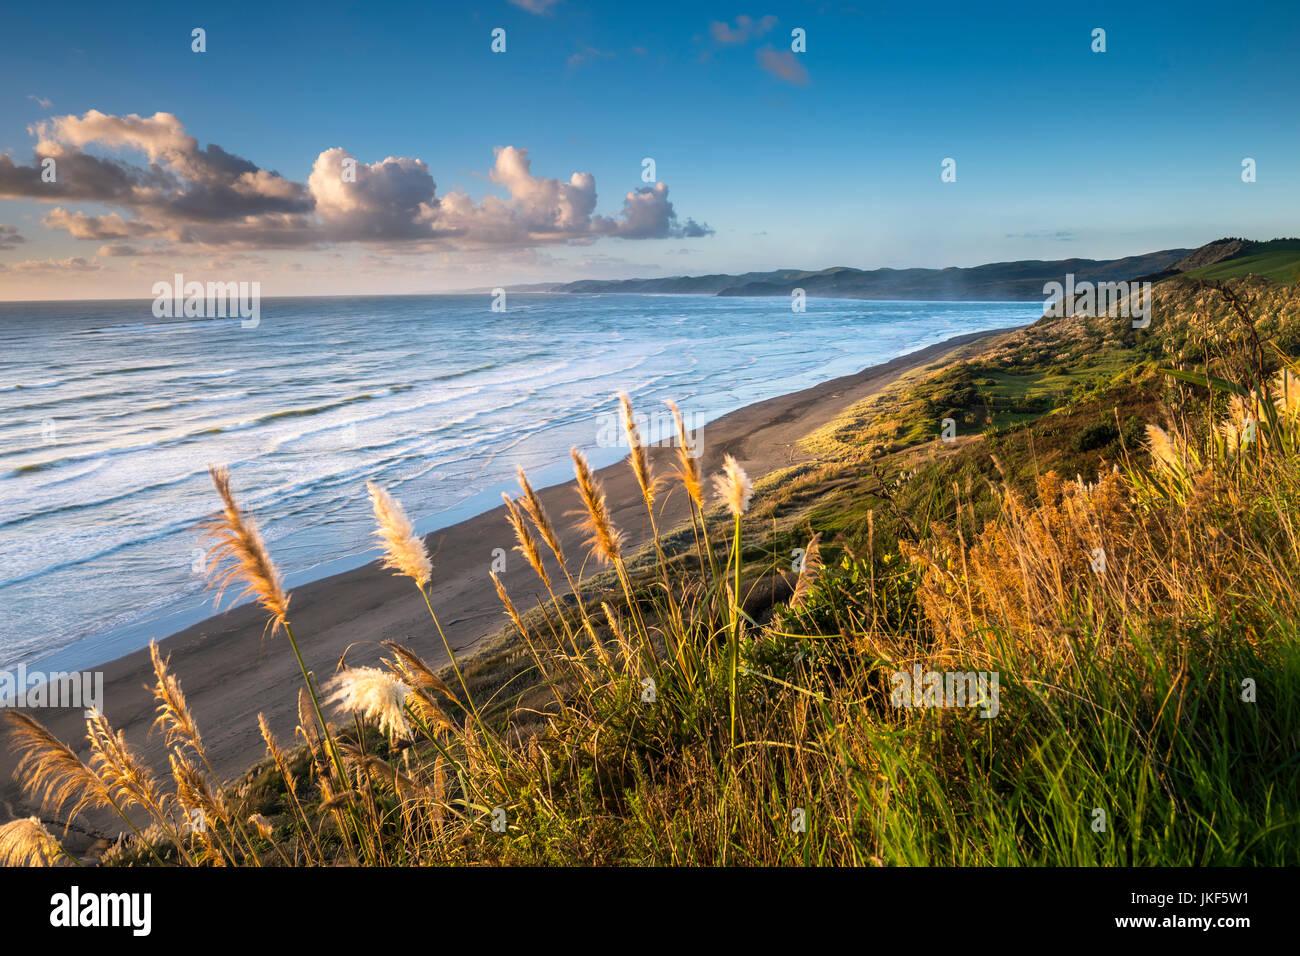 Nuova Zelanda, Isola del nord, raglan, ngarunui beach in serata Immagini Stock